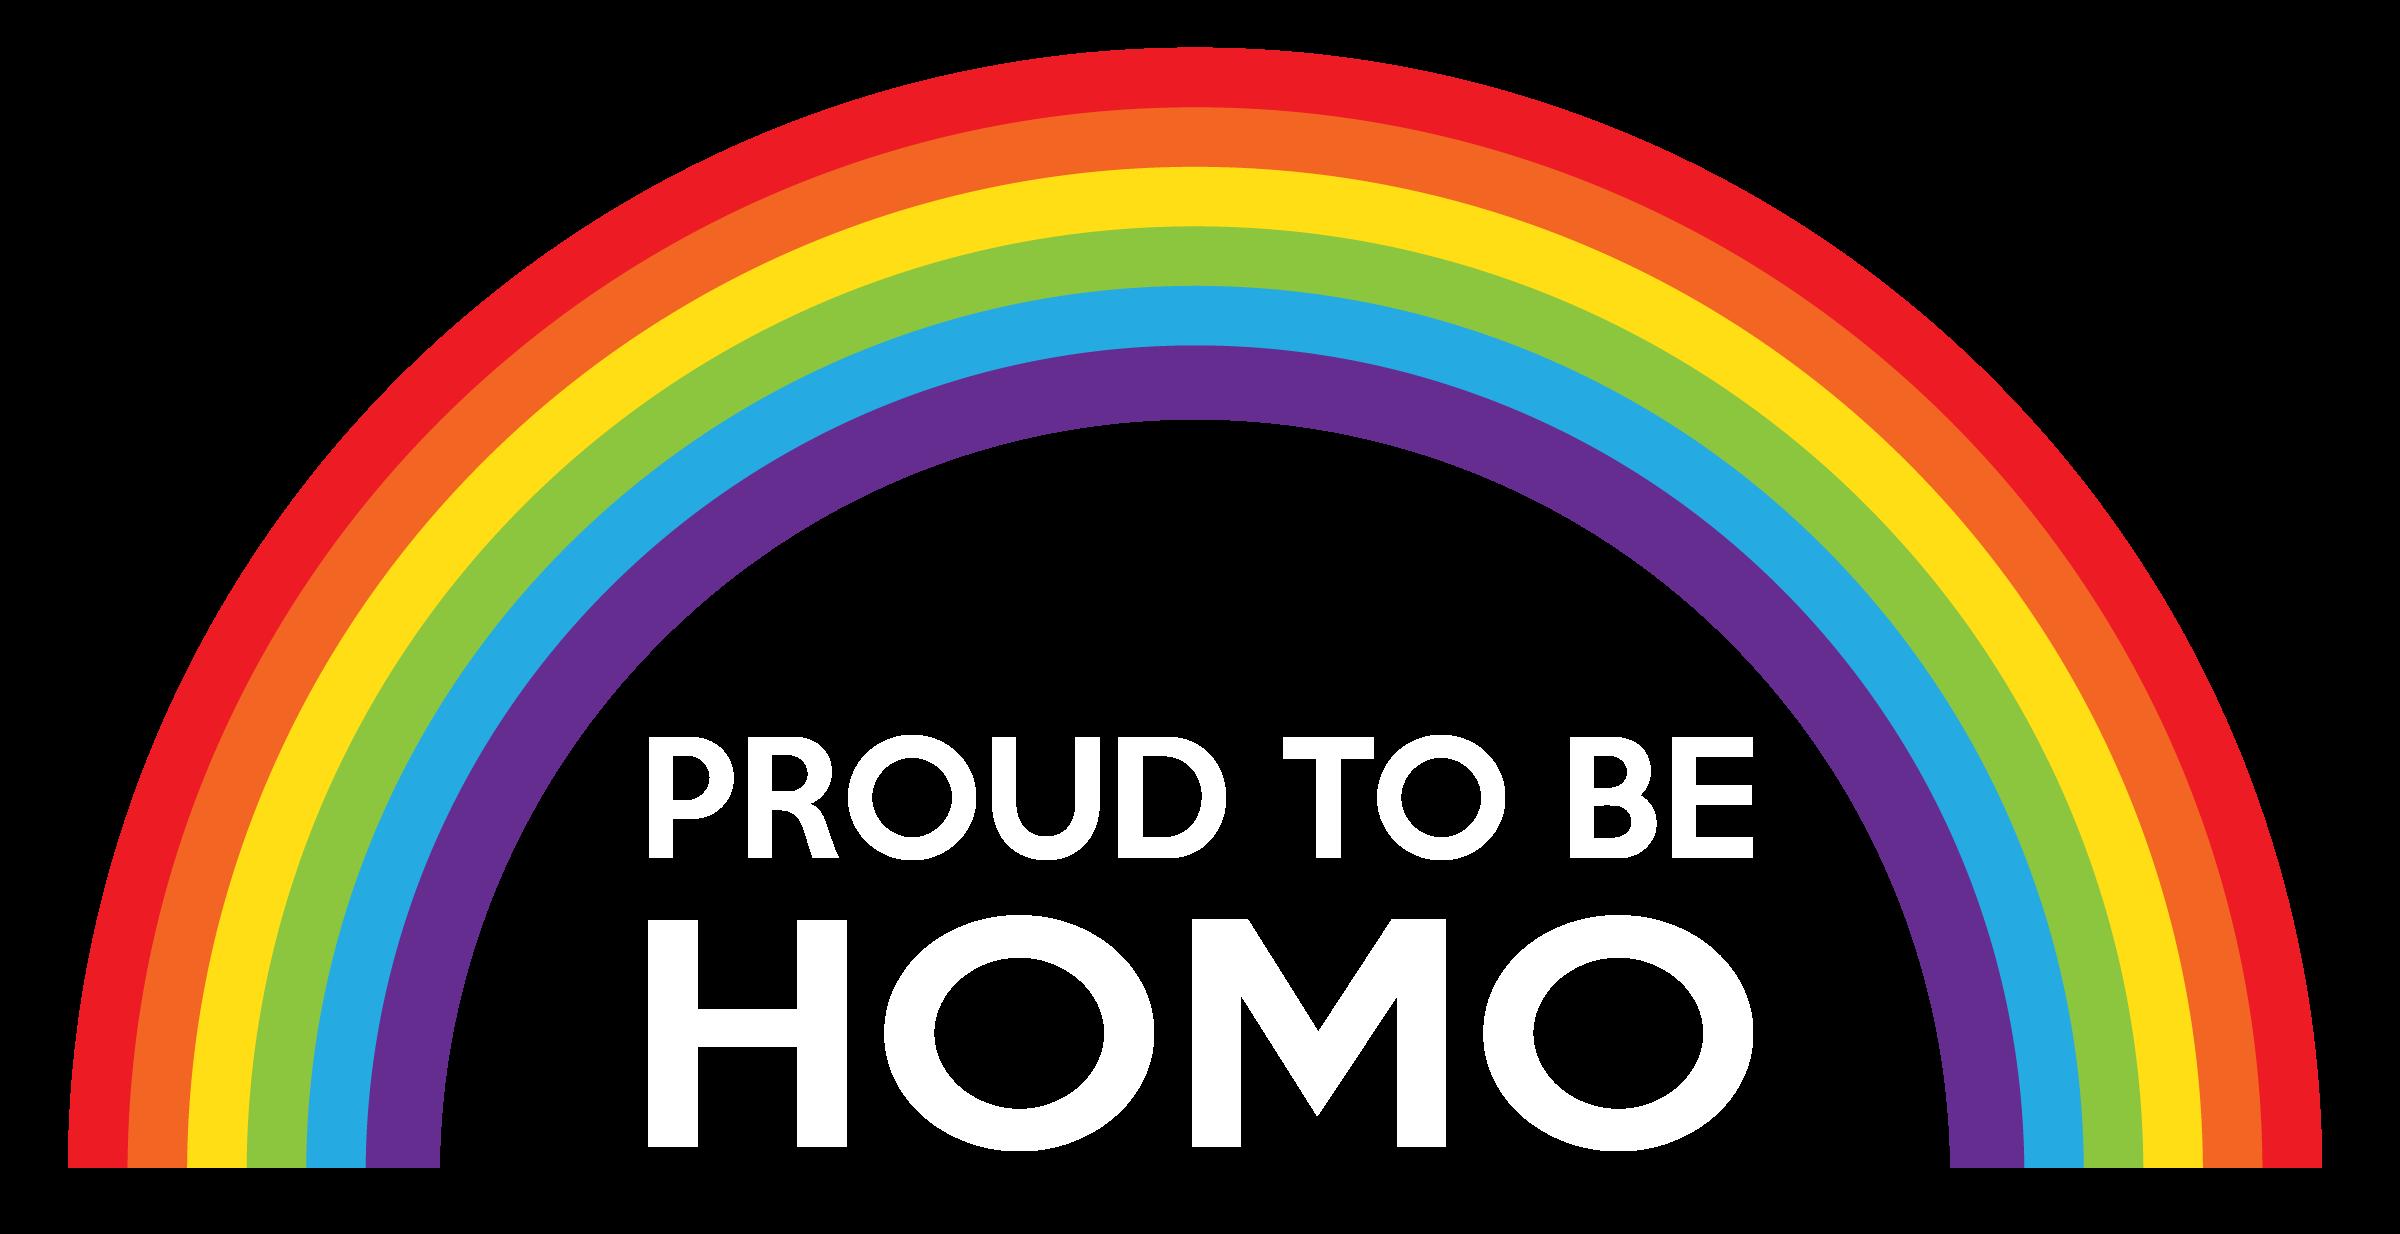 LGBT PNG Transparent Images.